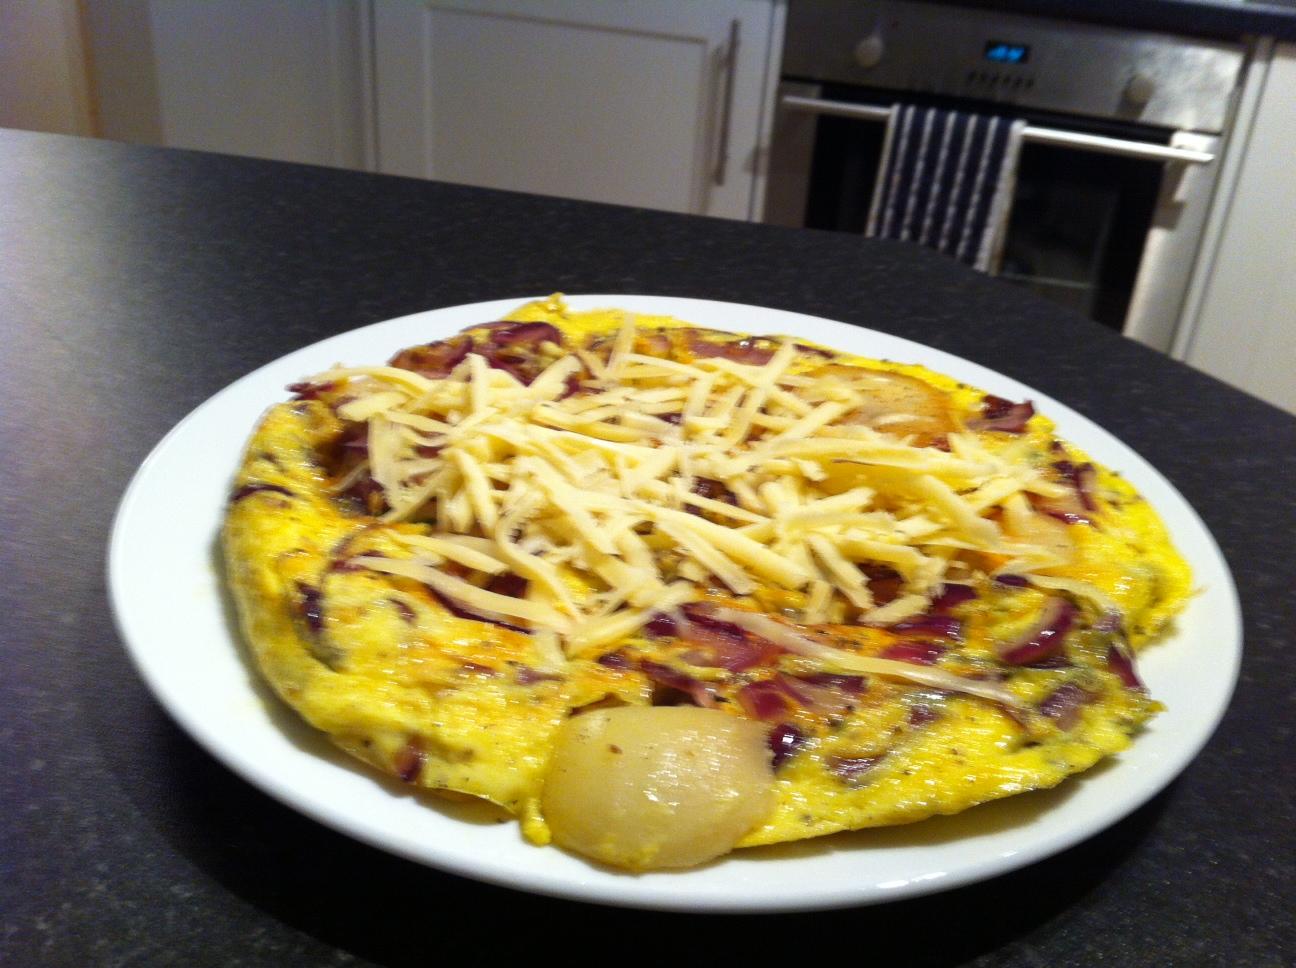 Spanish omelette view 2